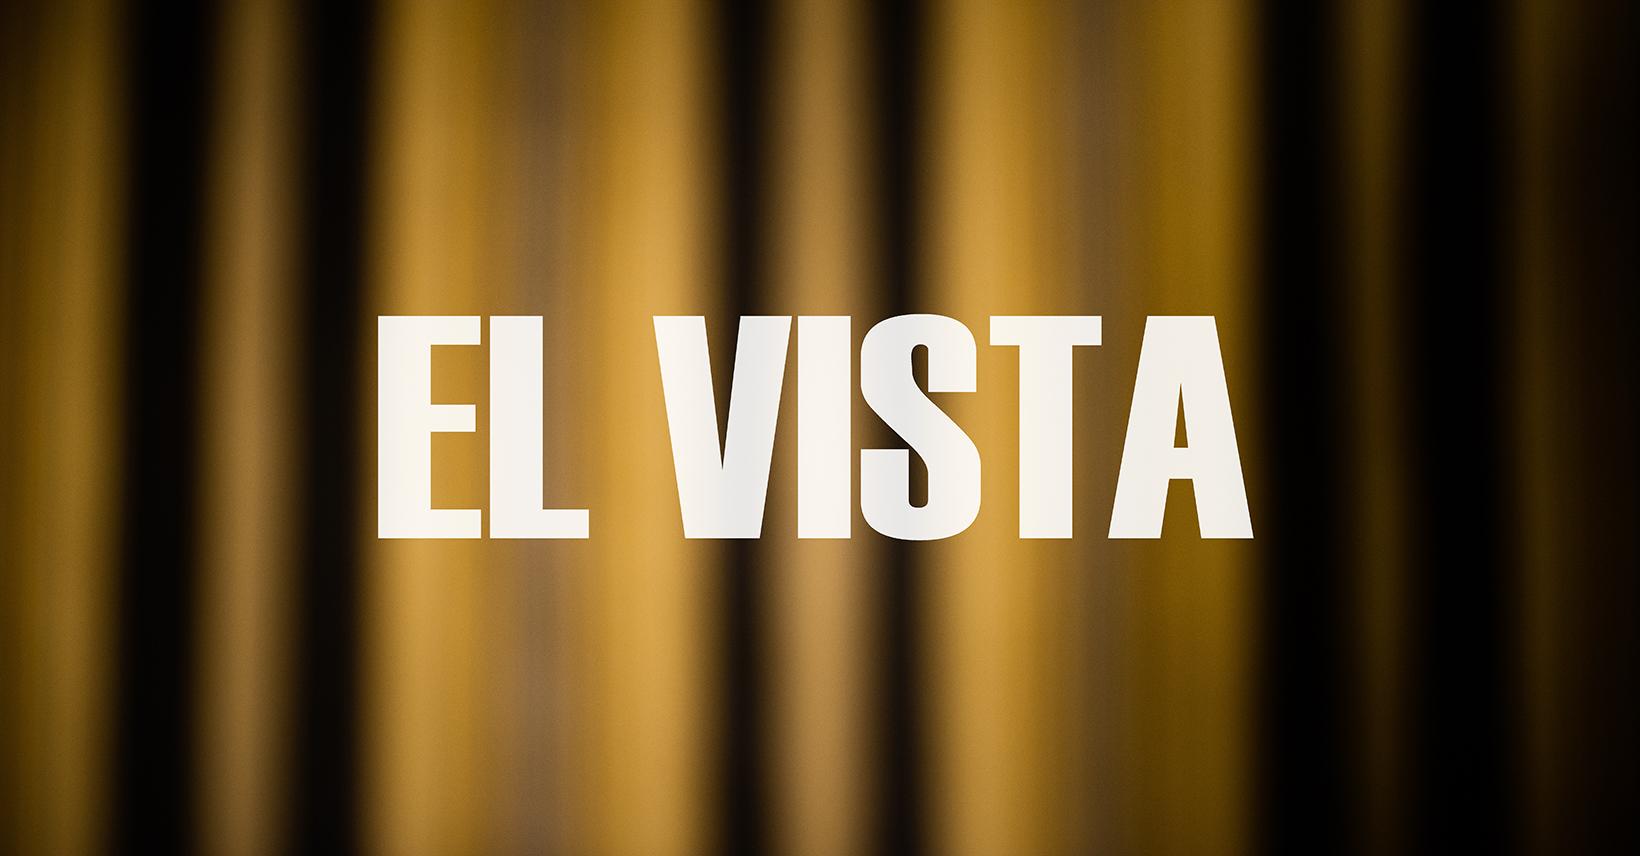 el vista - artist interviews